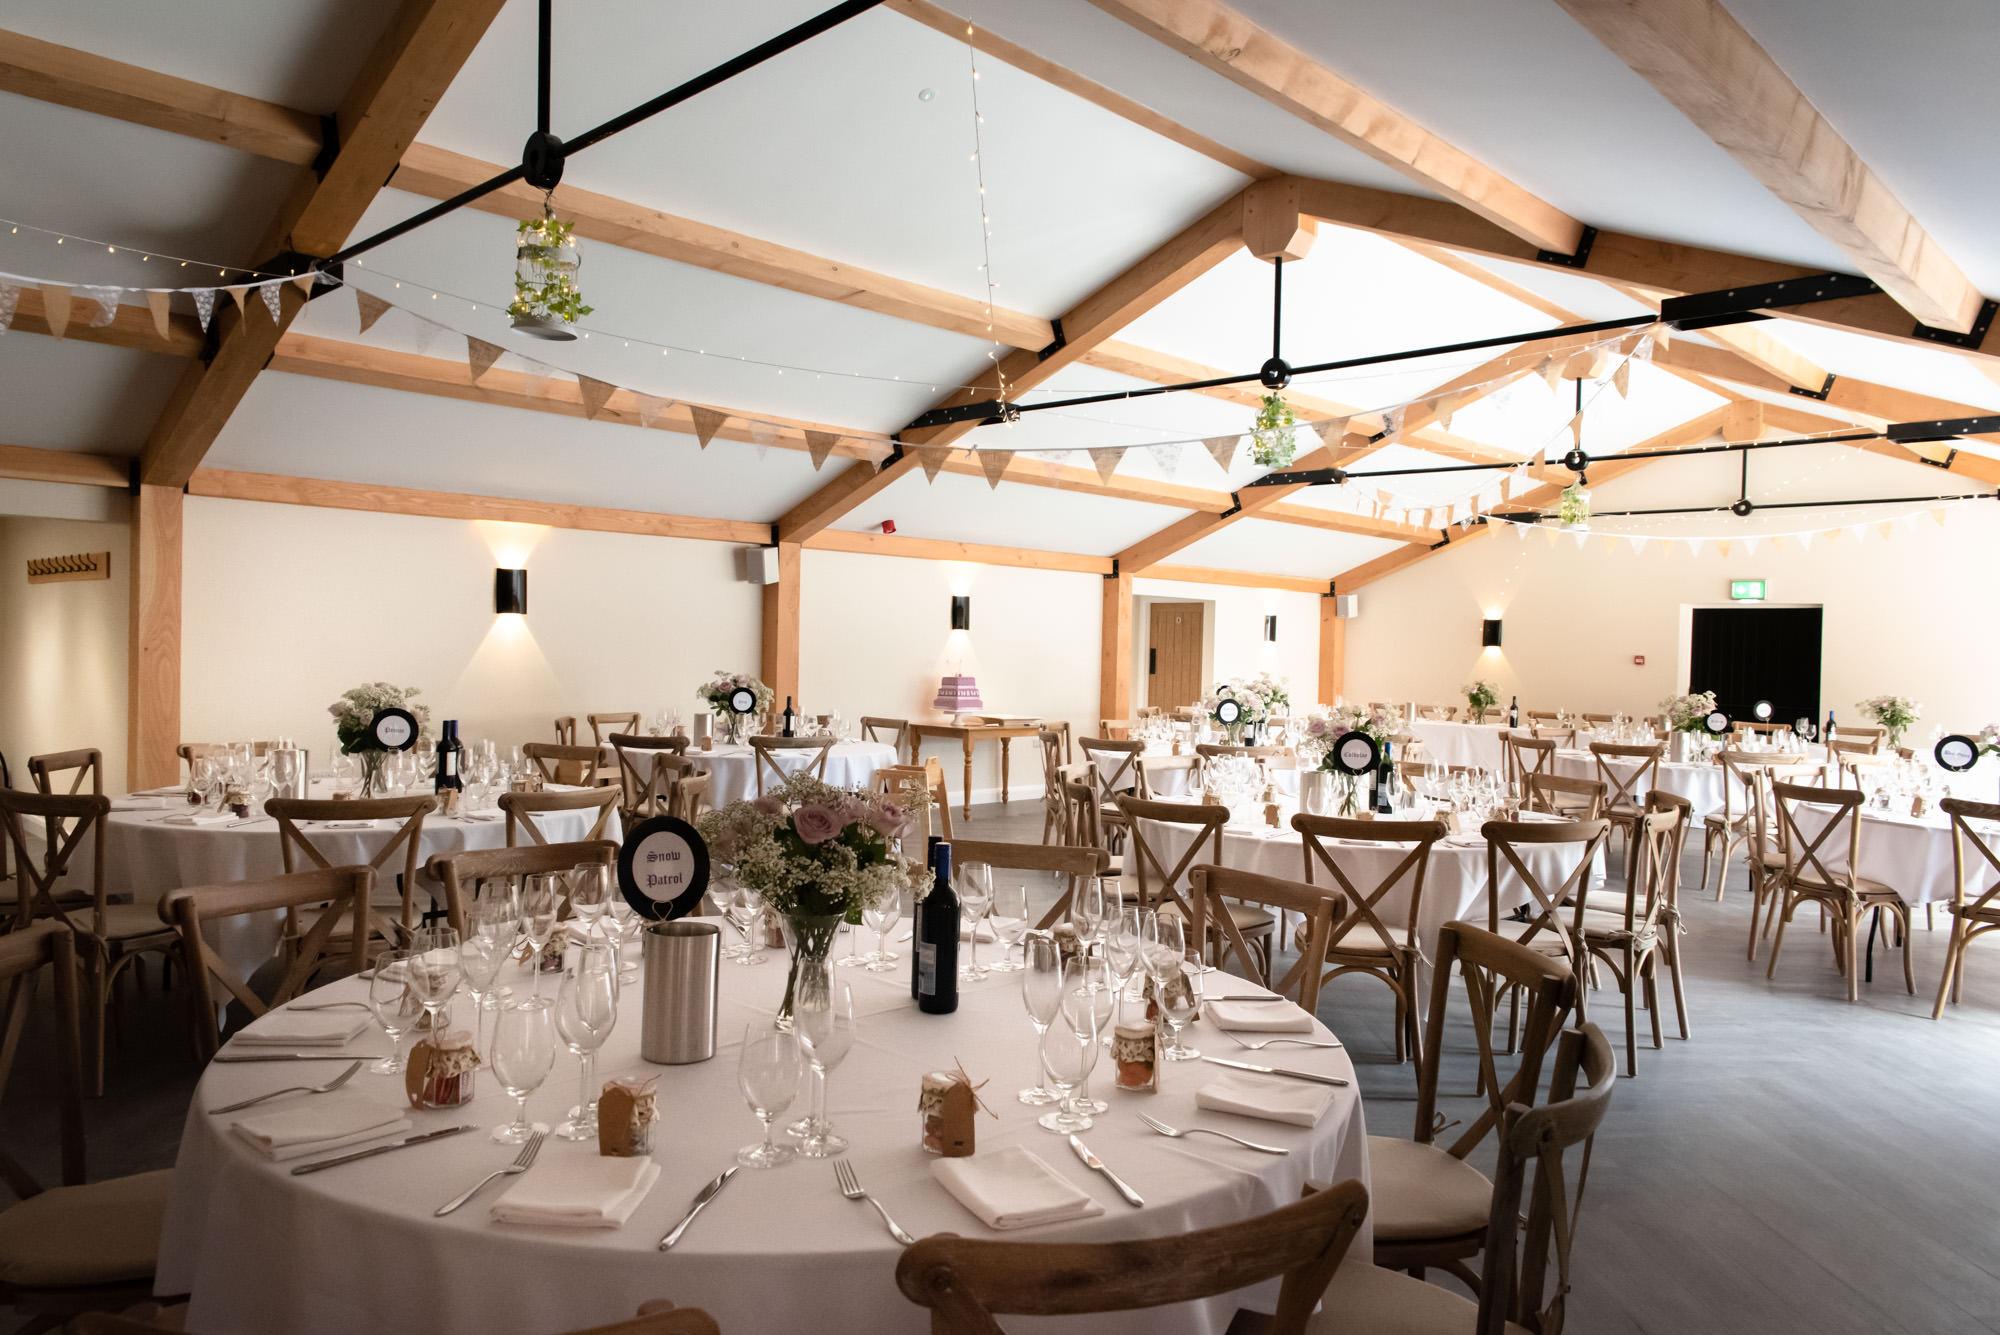 The Woodend Barn ready for the wedding breakfast at Hanbury wedding Barn